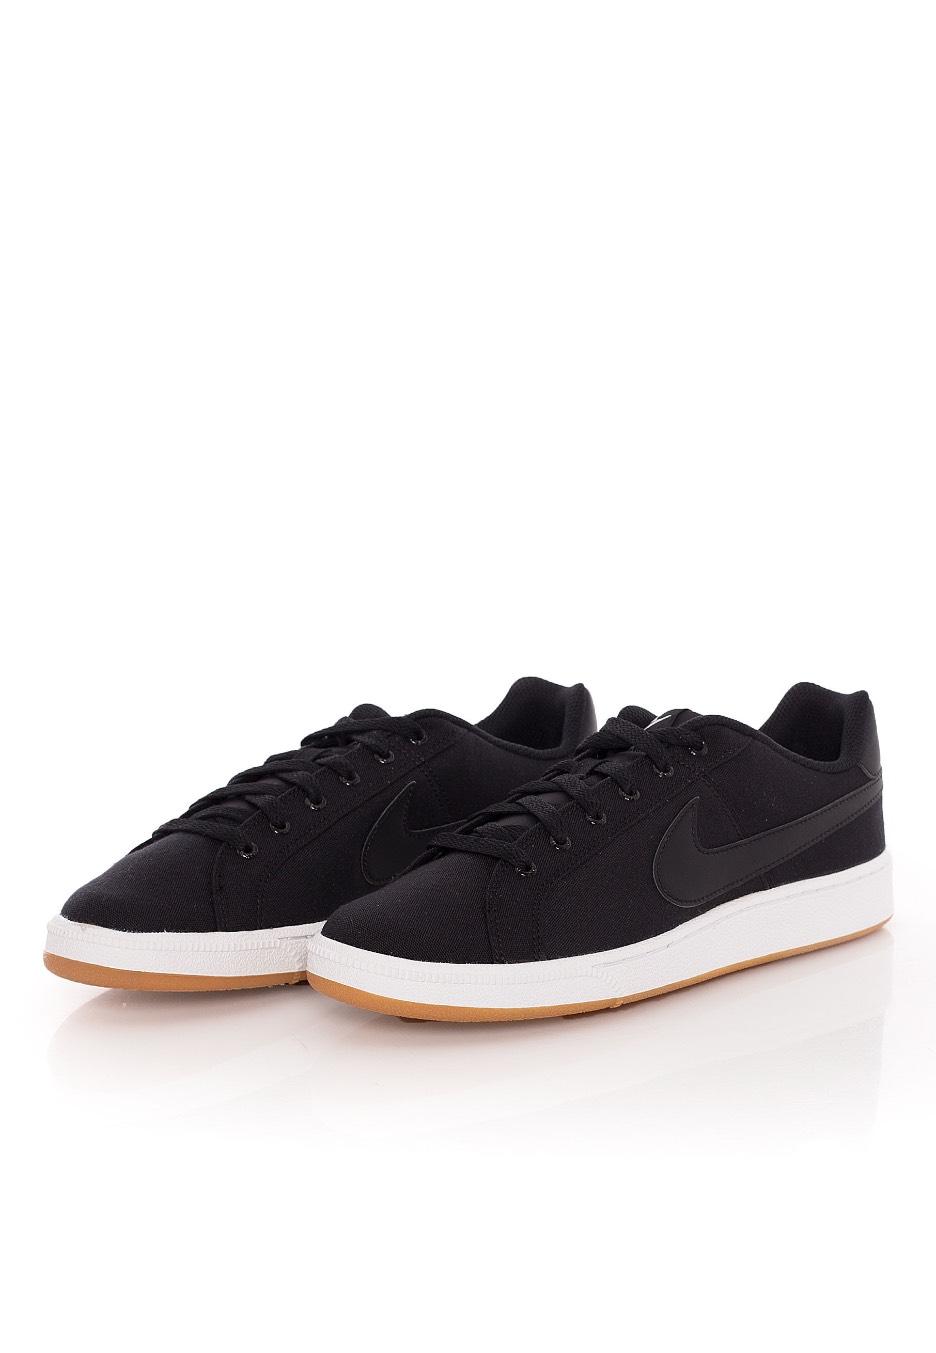 Nike - Court Royale Canvas Black/White